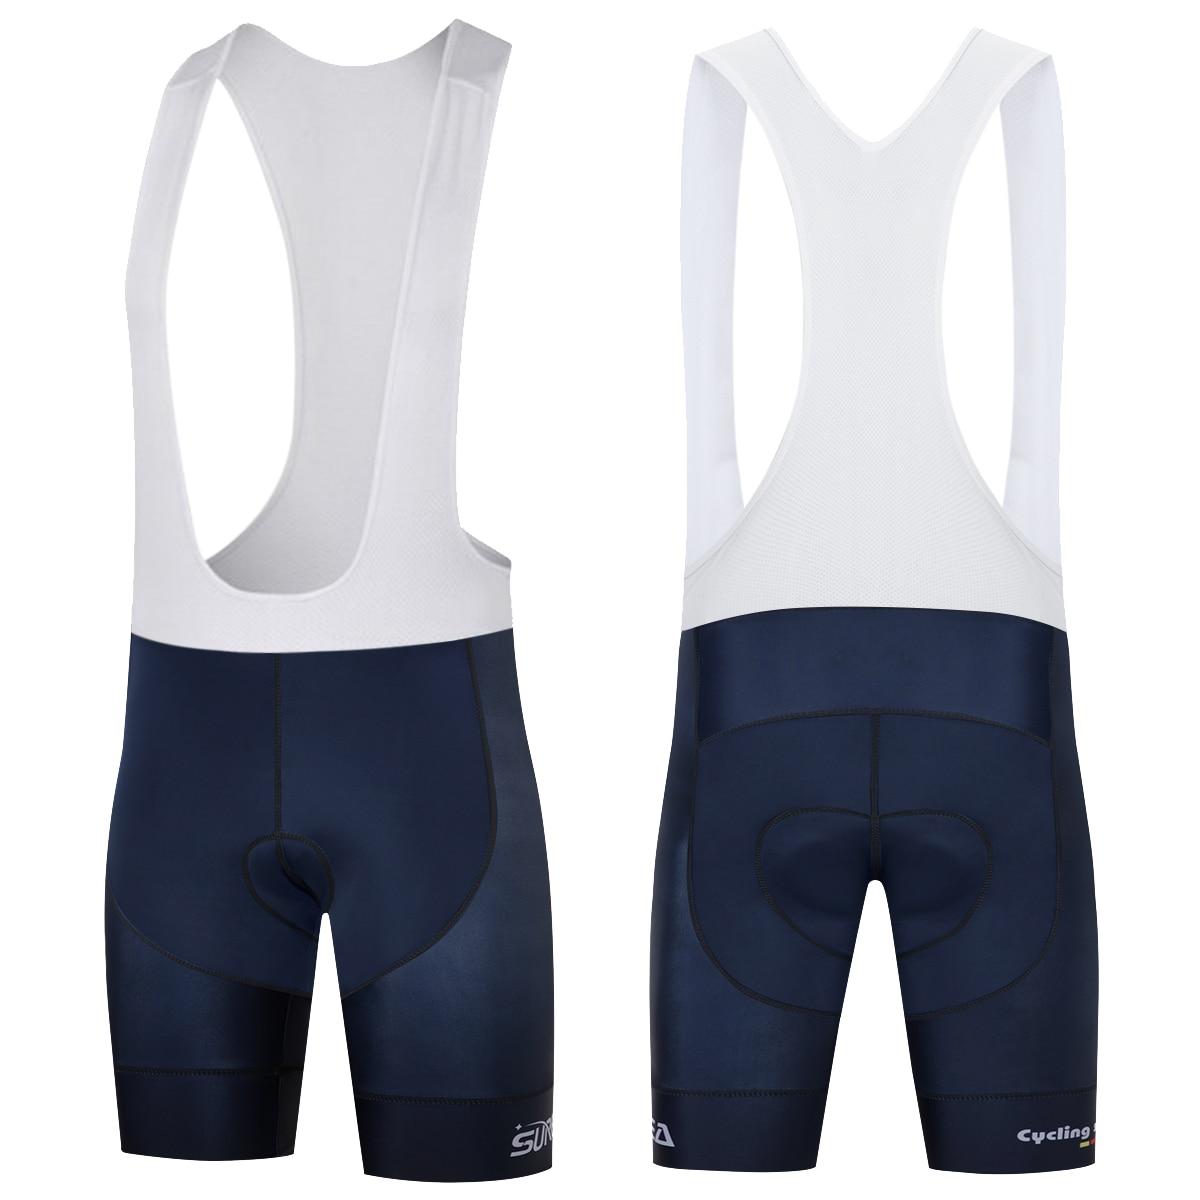 SUREA Mens Cycling Shorts Bicycle Bike Mtb Blue 3D Padded Coolmax Gel Black Fitness Outdoor Cycling Shorts XS-4XL